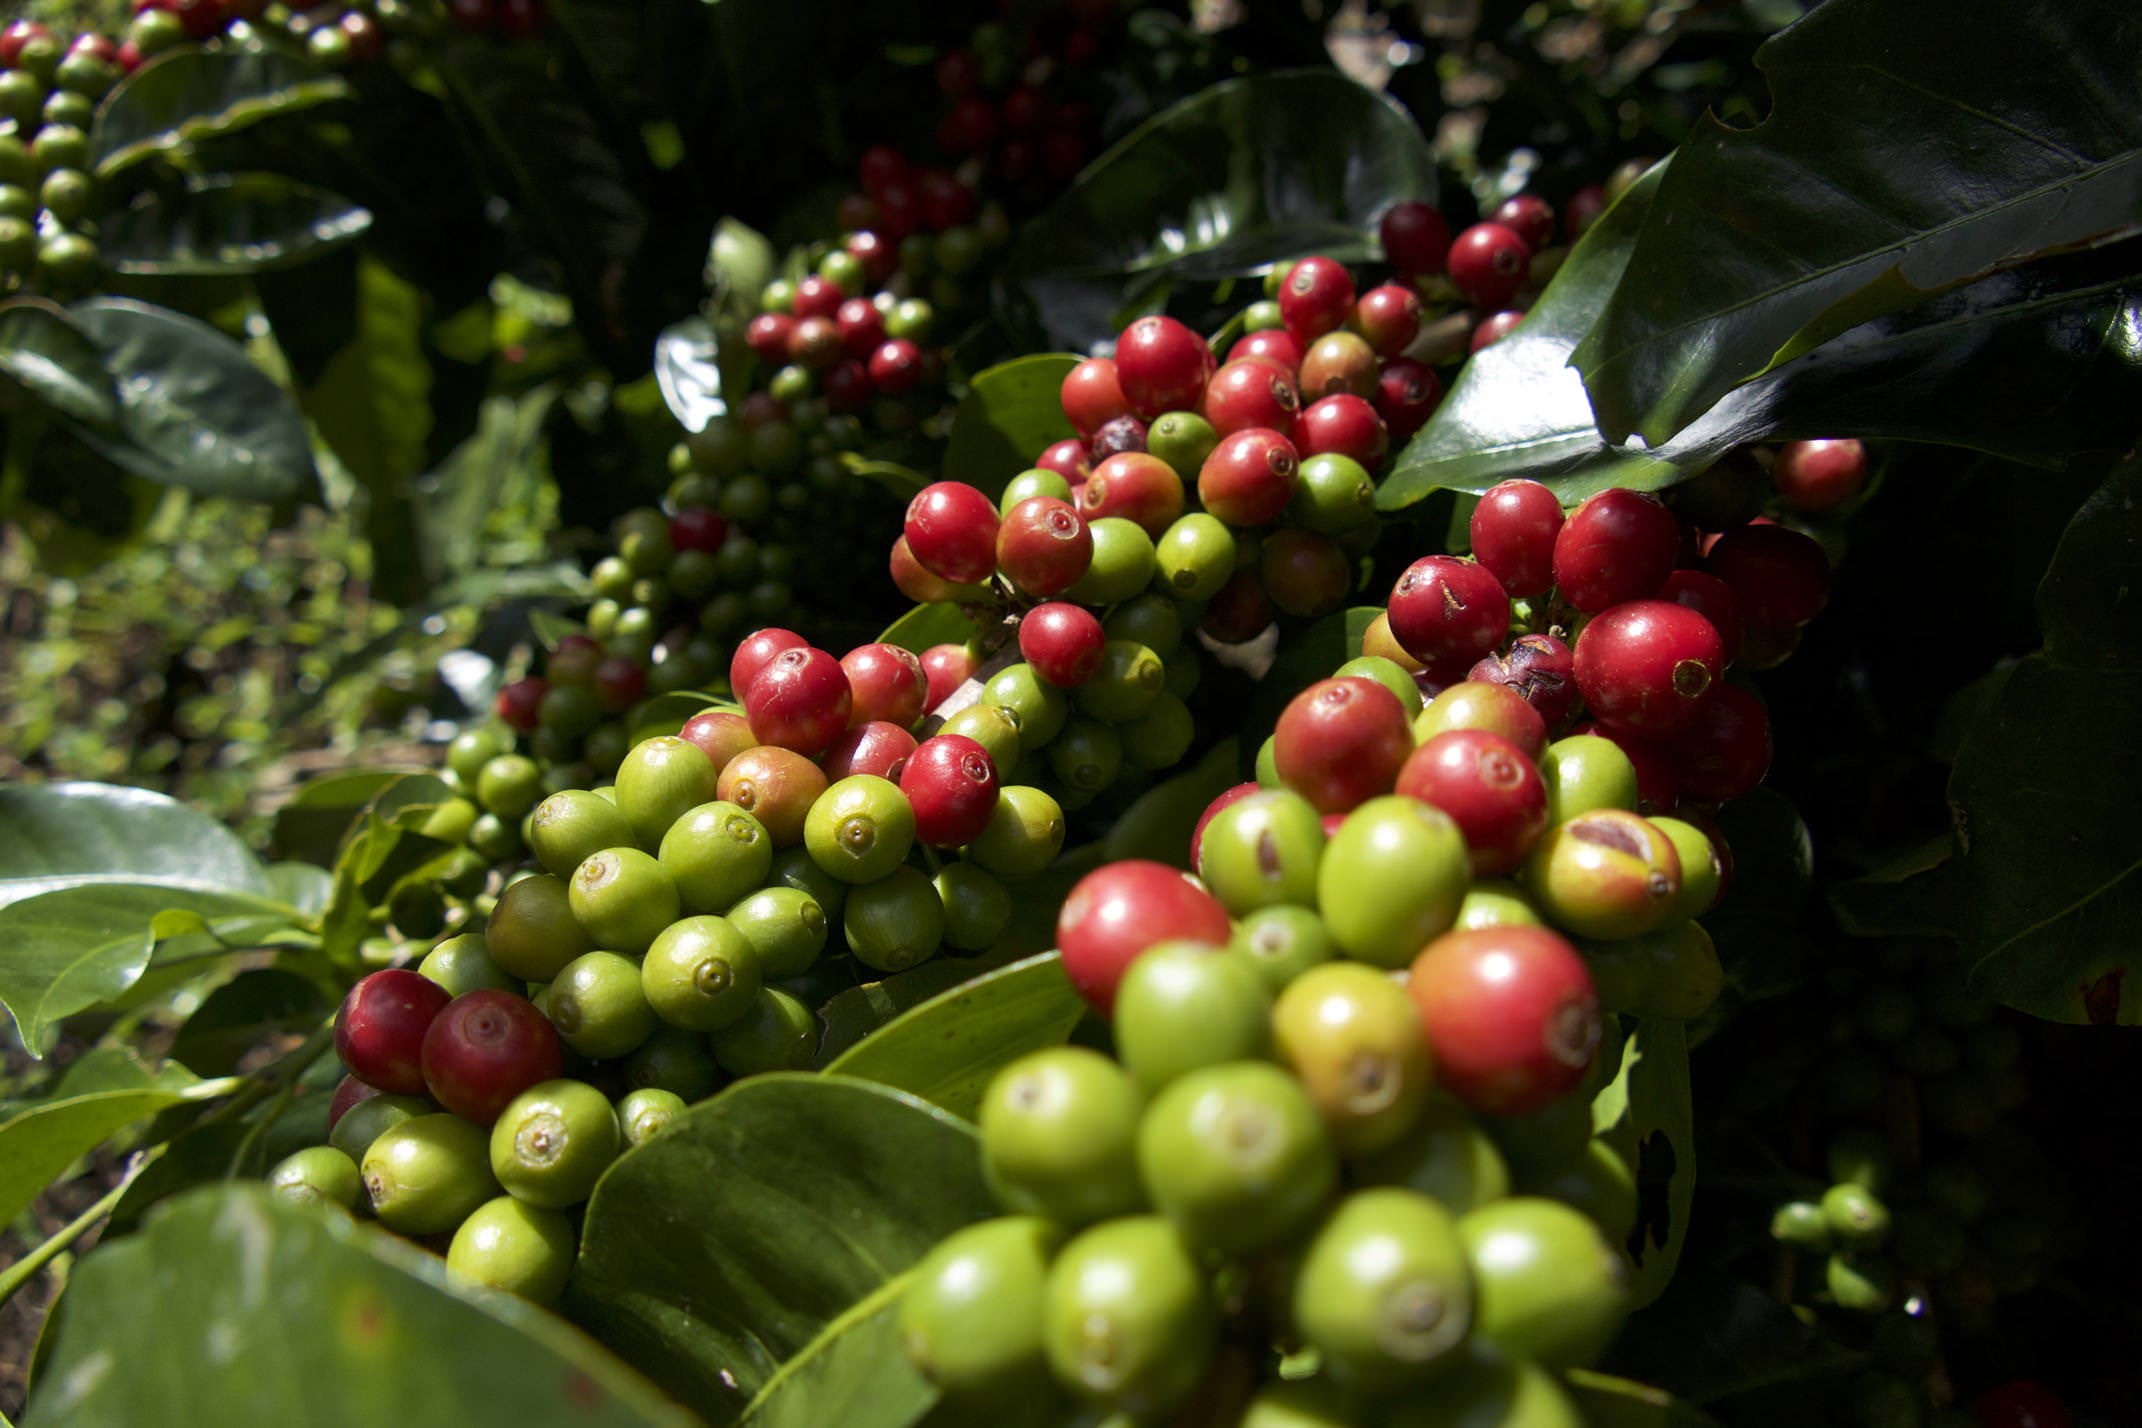 Costa rica san gerardo rivas chirripo coffee ripe beans